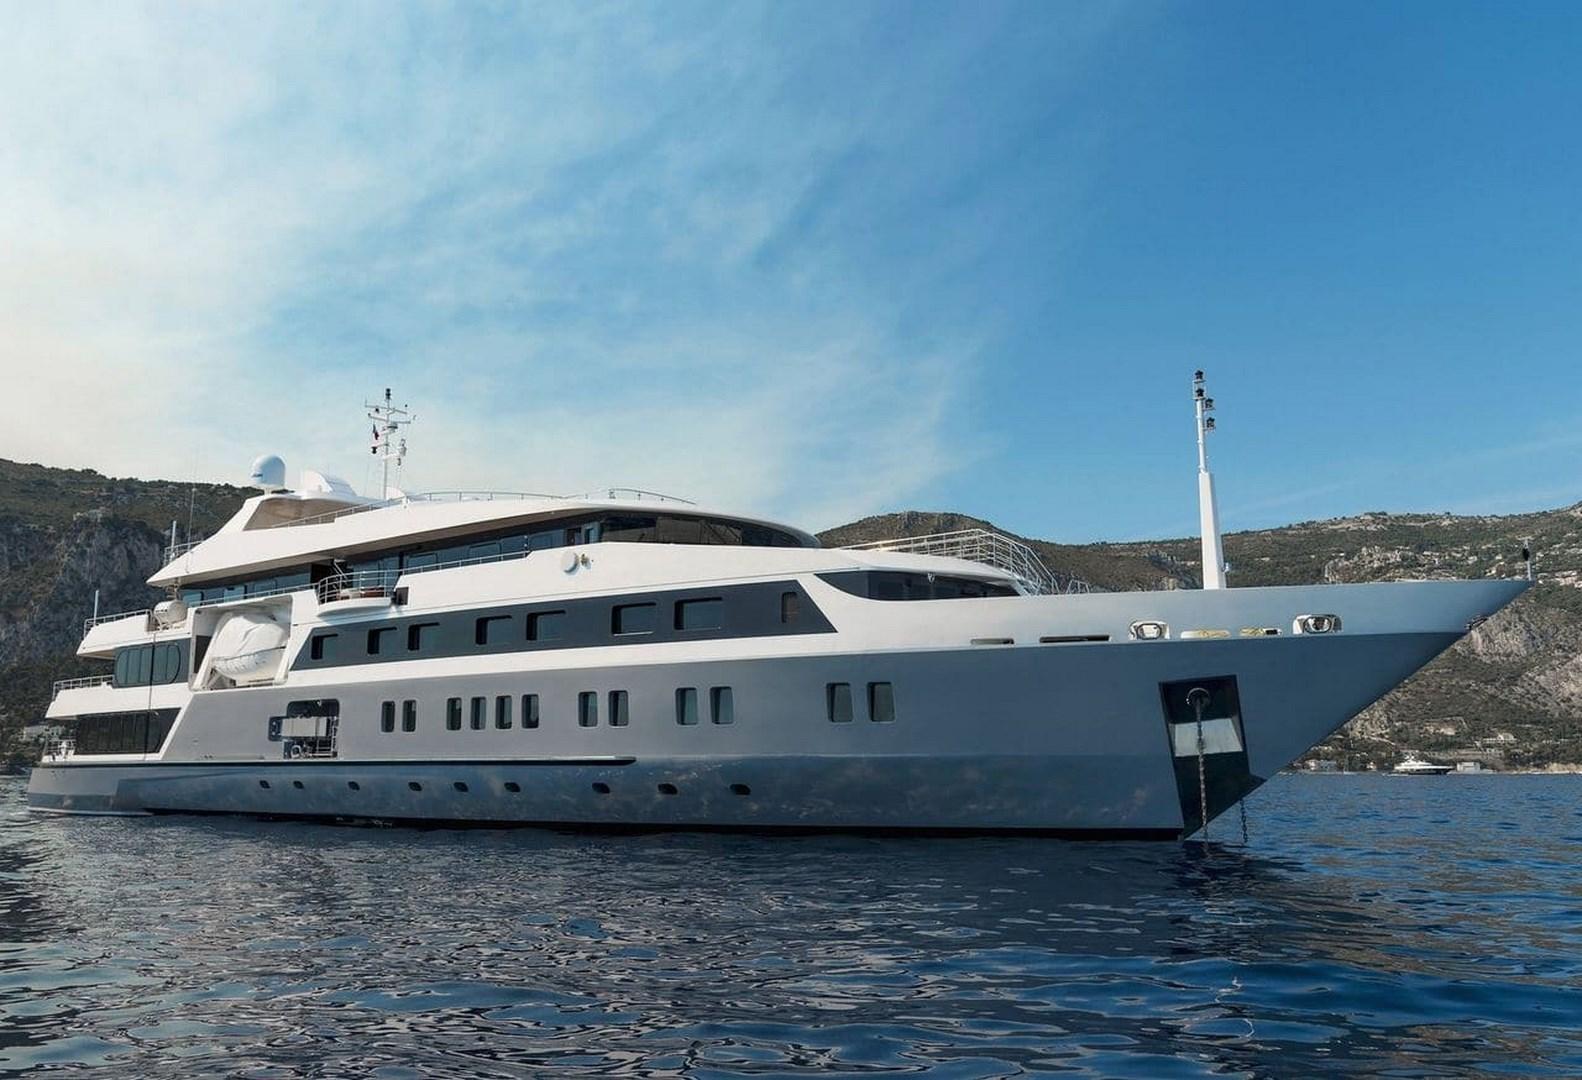 Motor Yacht 2004 L022033082001 12